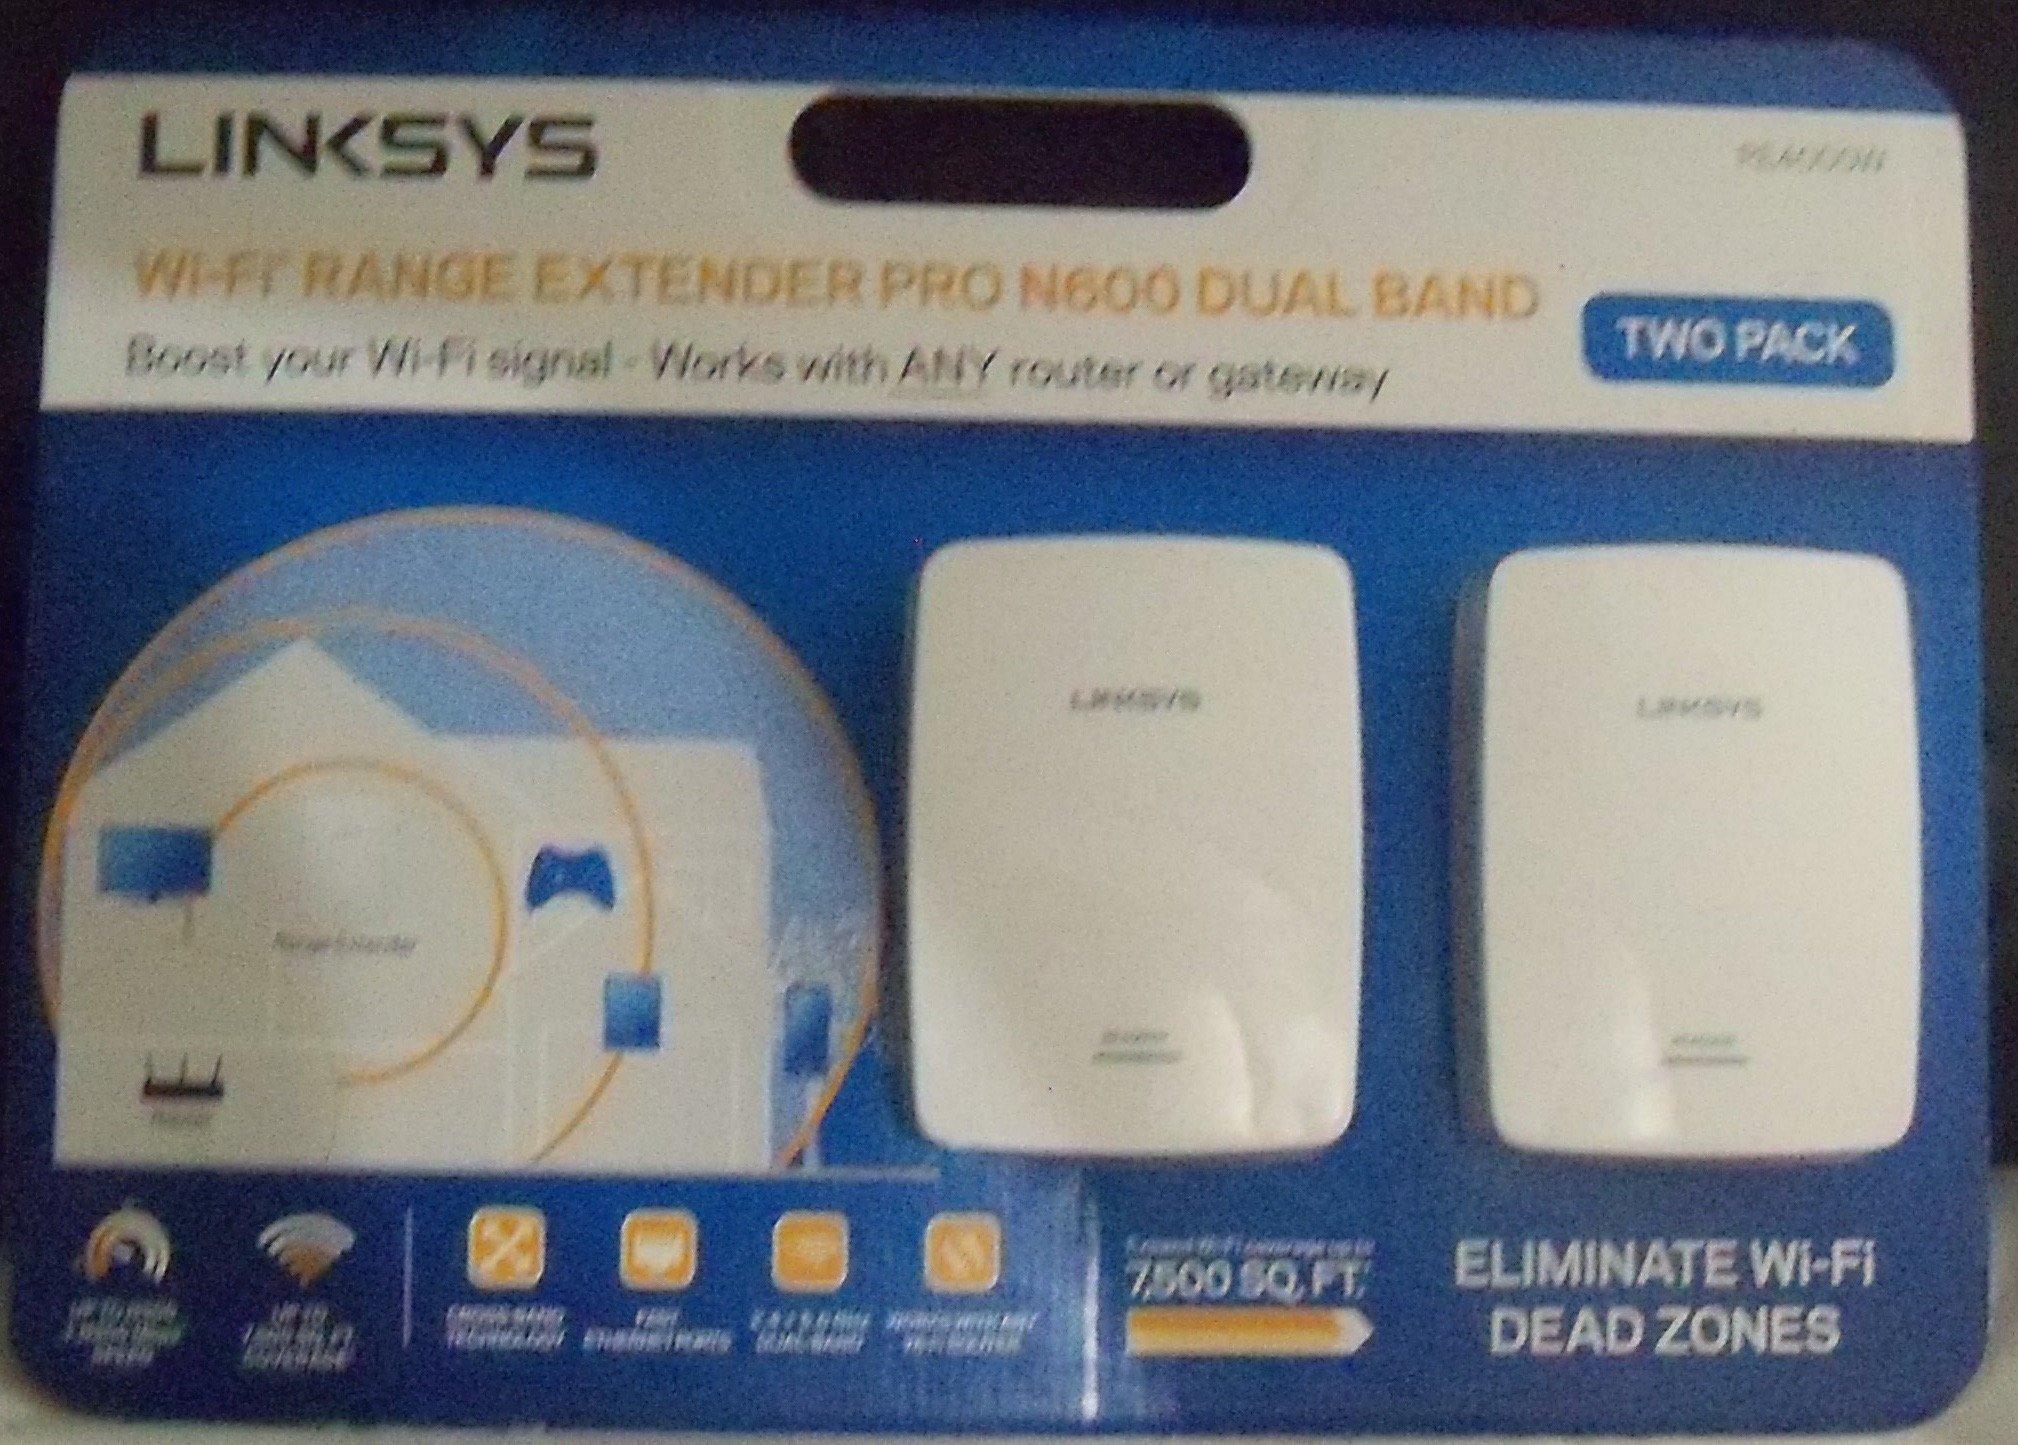 Linksys Wi-Fi Range Extender Pro N600 Dual Band RE4000W White 2-Pac